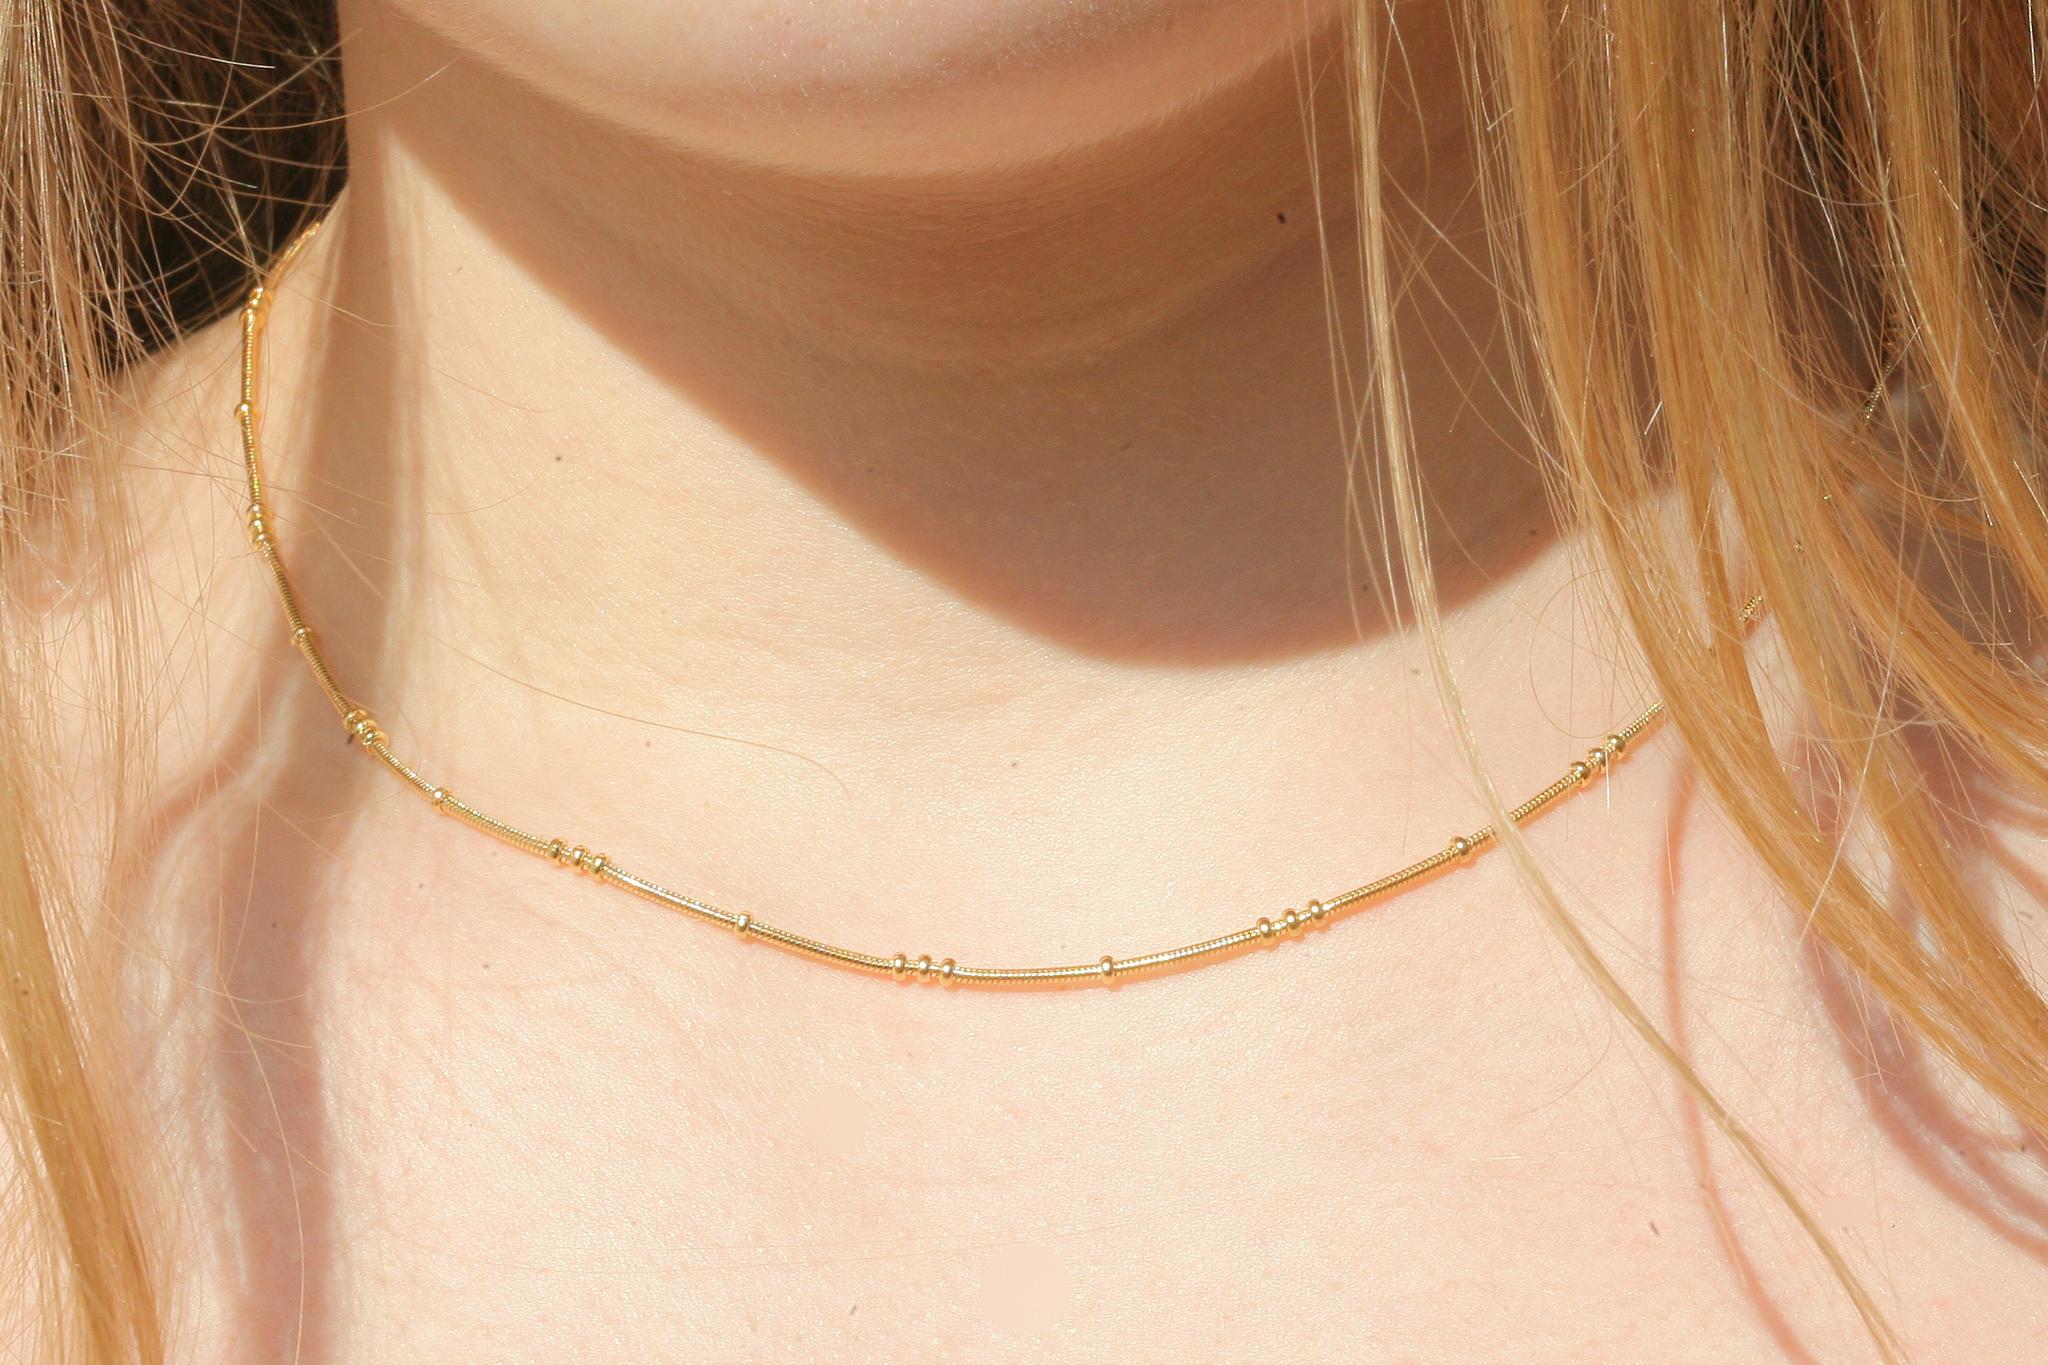 artjany vergoldete  Schlangenkette mit Kugeln